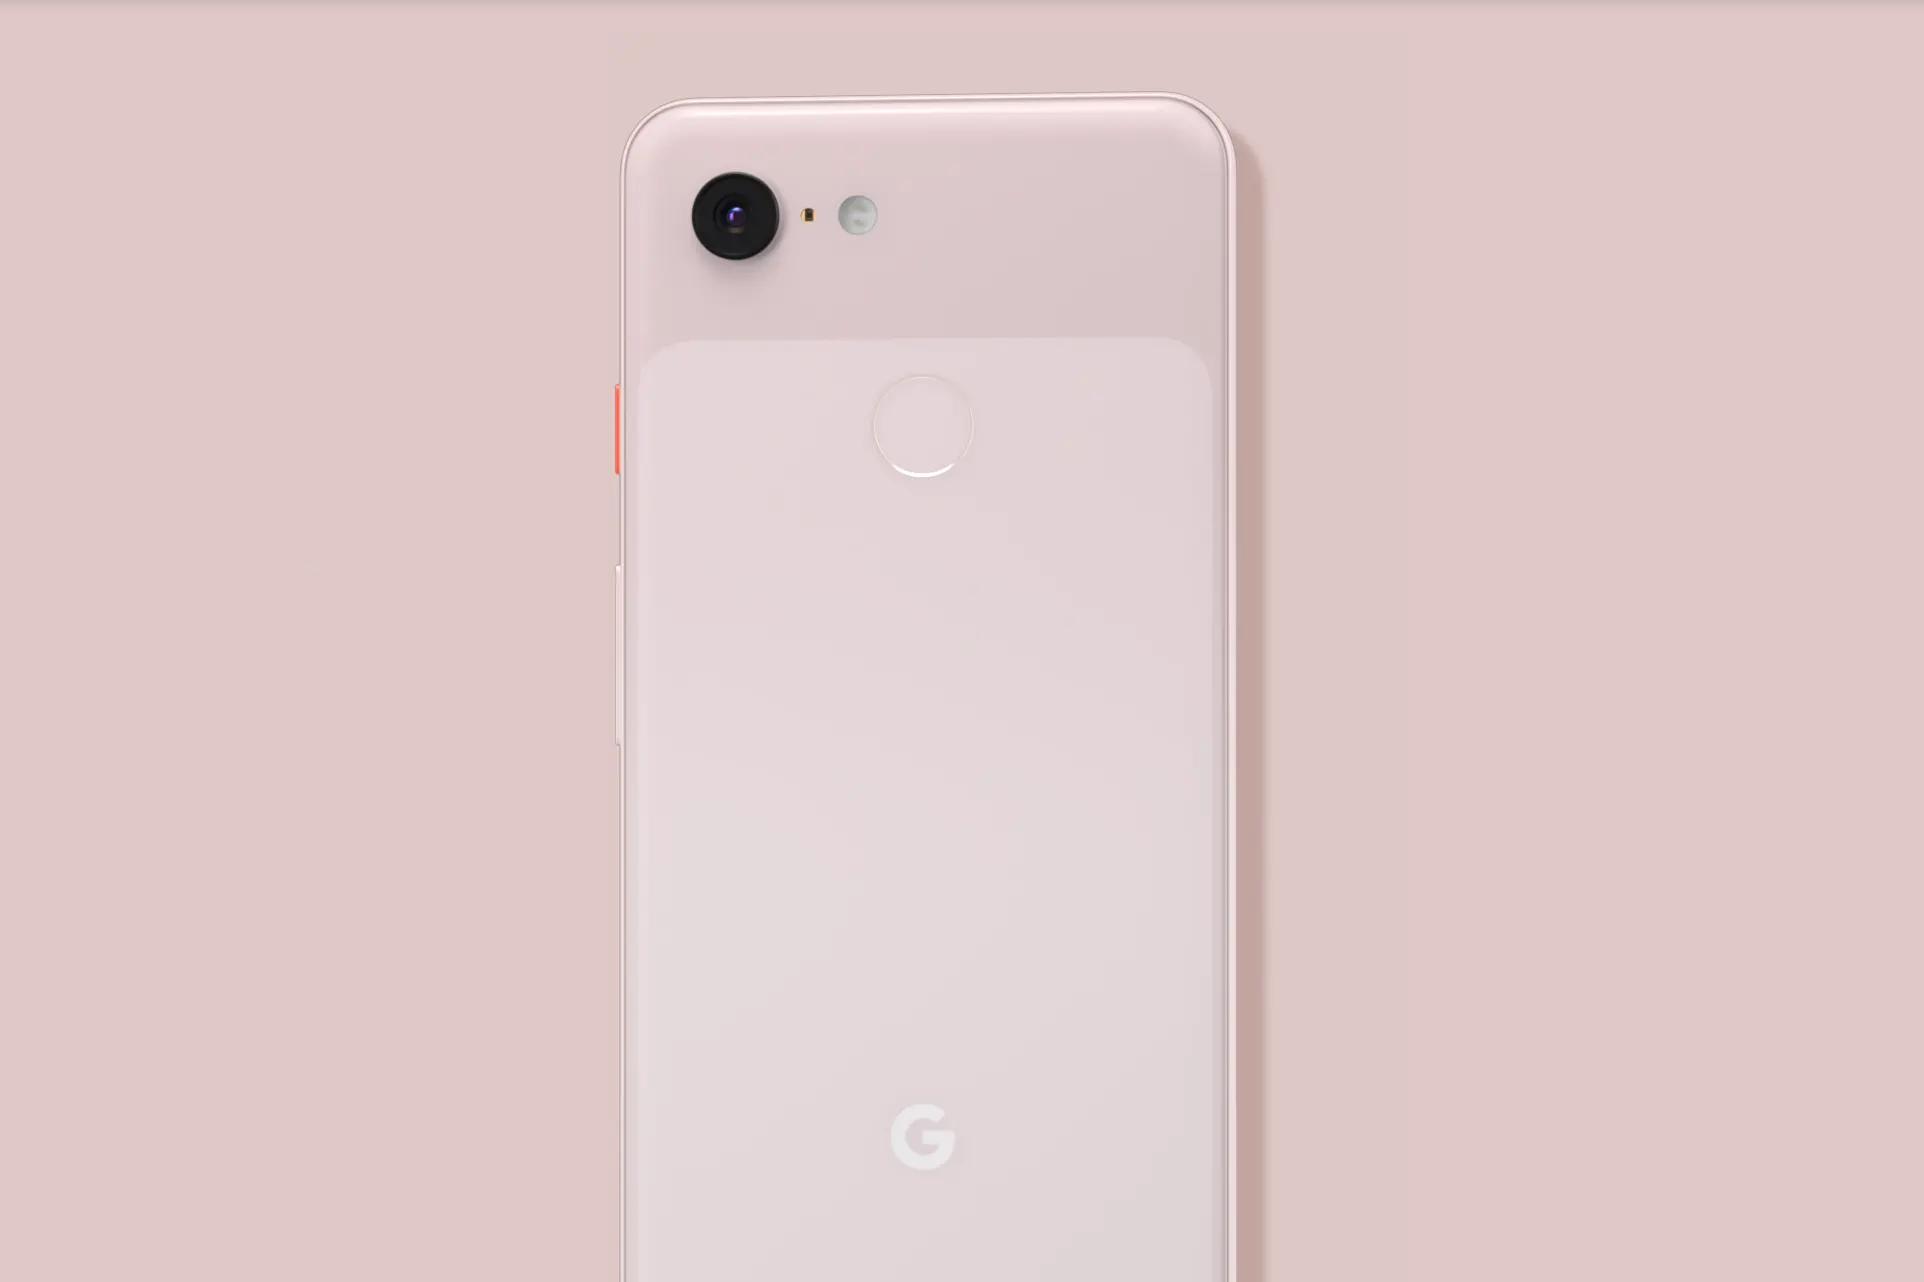 Google Pixel 3 / Pixel 3 XL 相机 App APK 下载